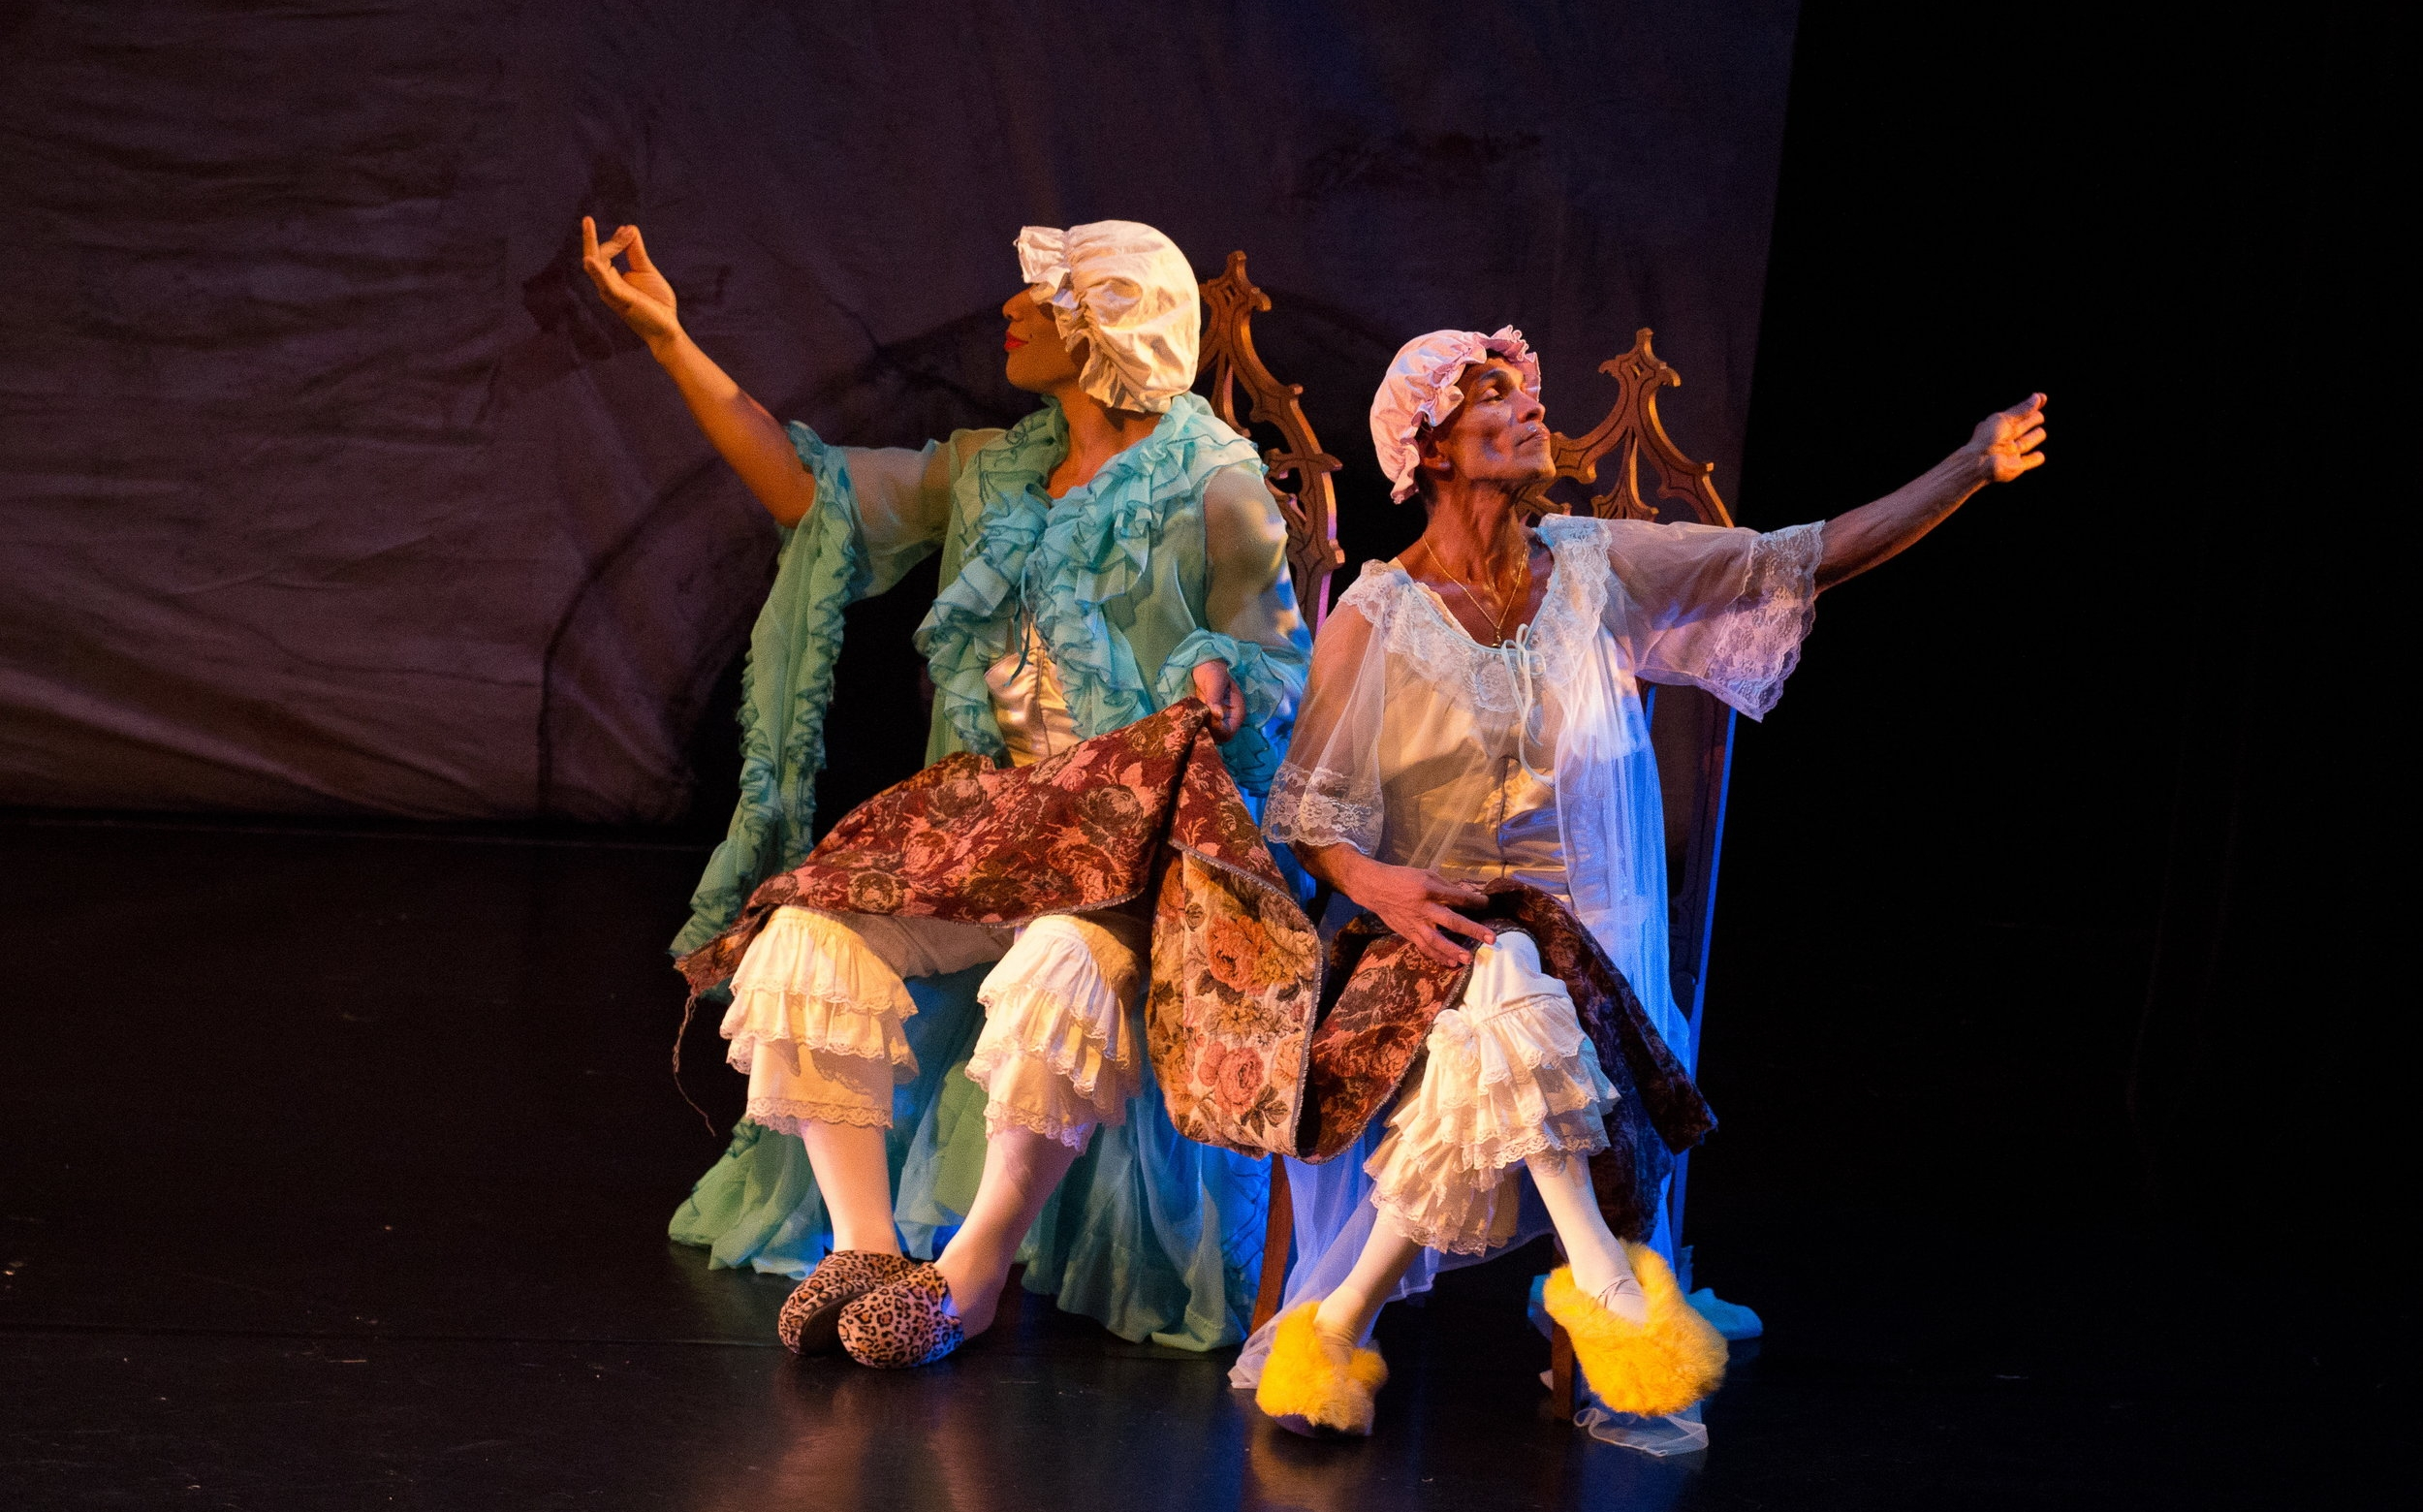 Dancers: Andrew Dawson & Vianor Broce